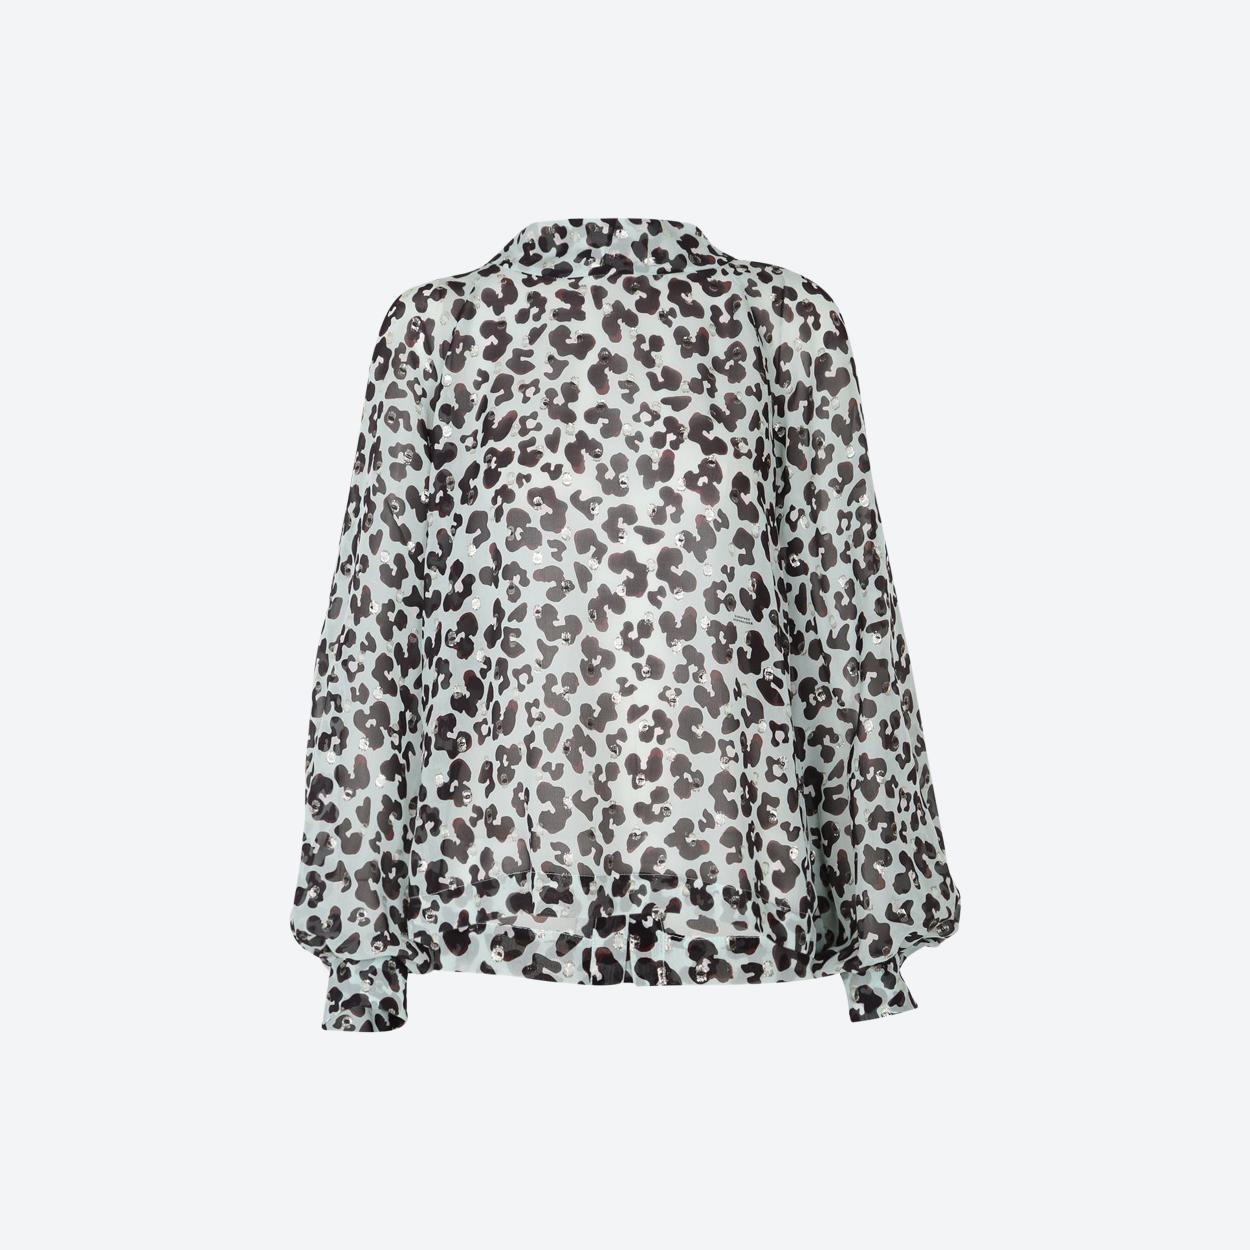 delicate-dazzle-blouse